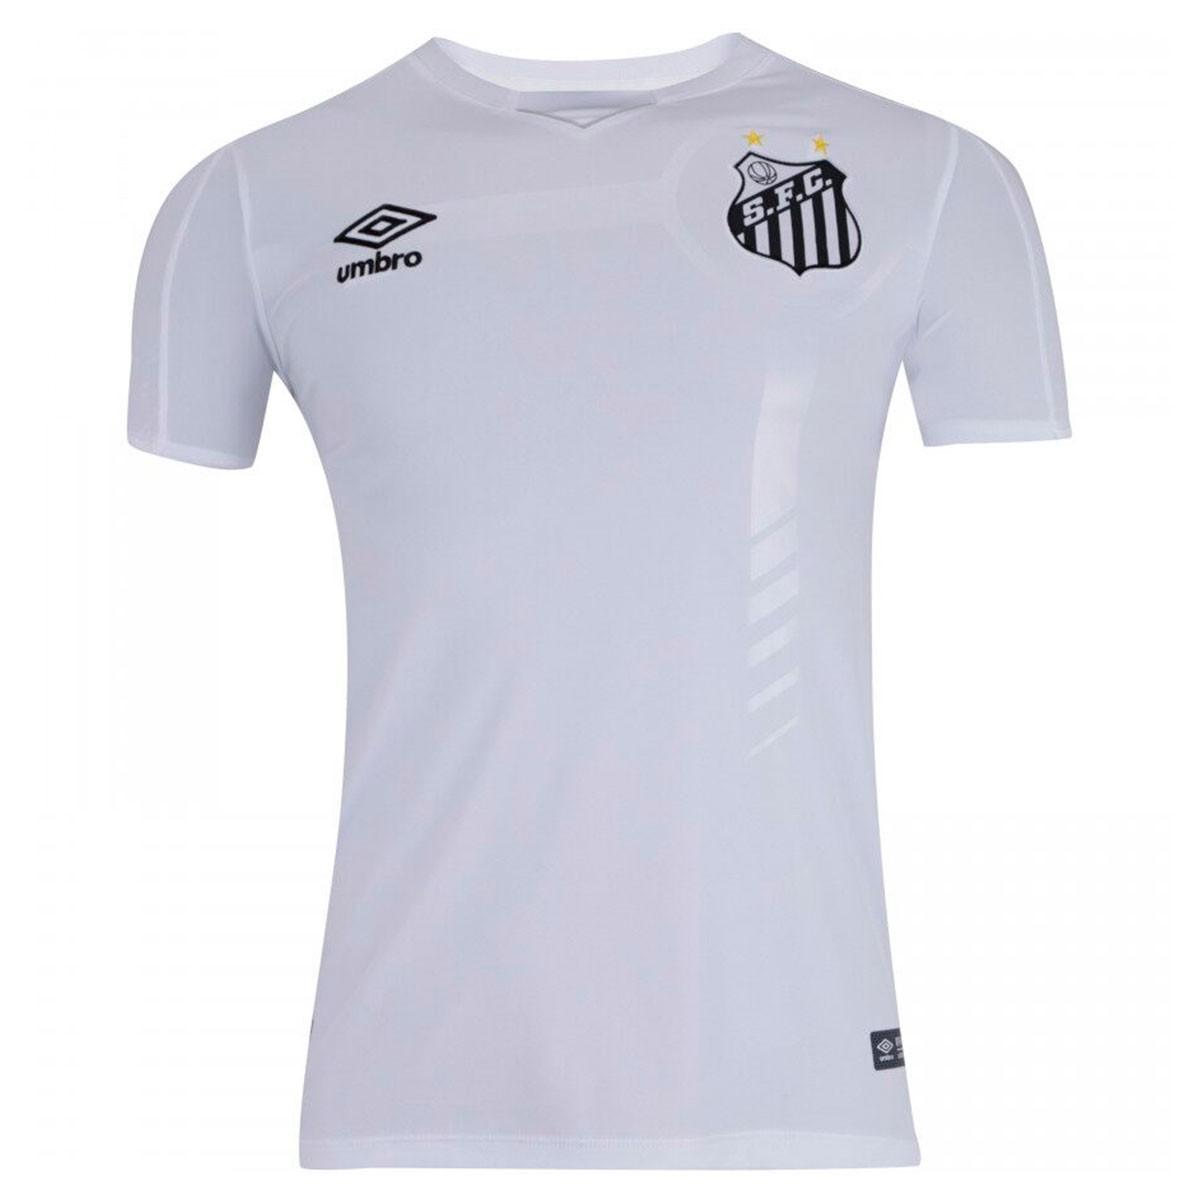 Camisa Santos Umbro Oficial I 2019/20 S/N - Masculina